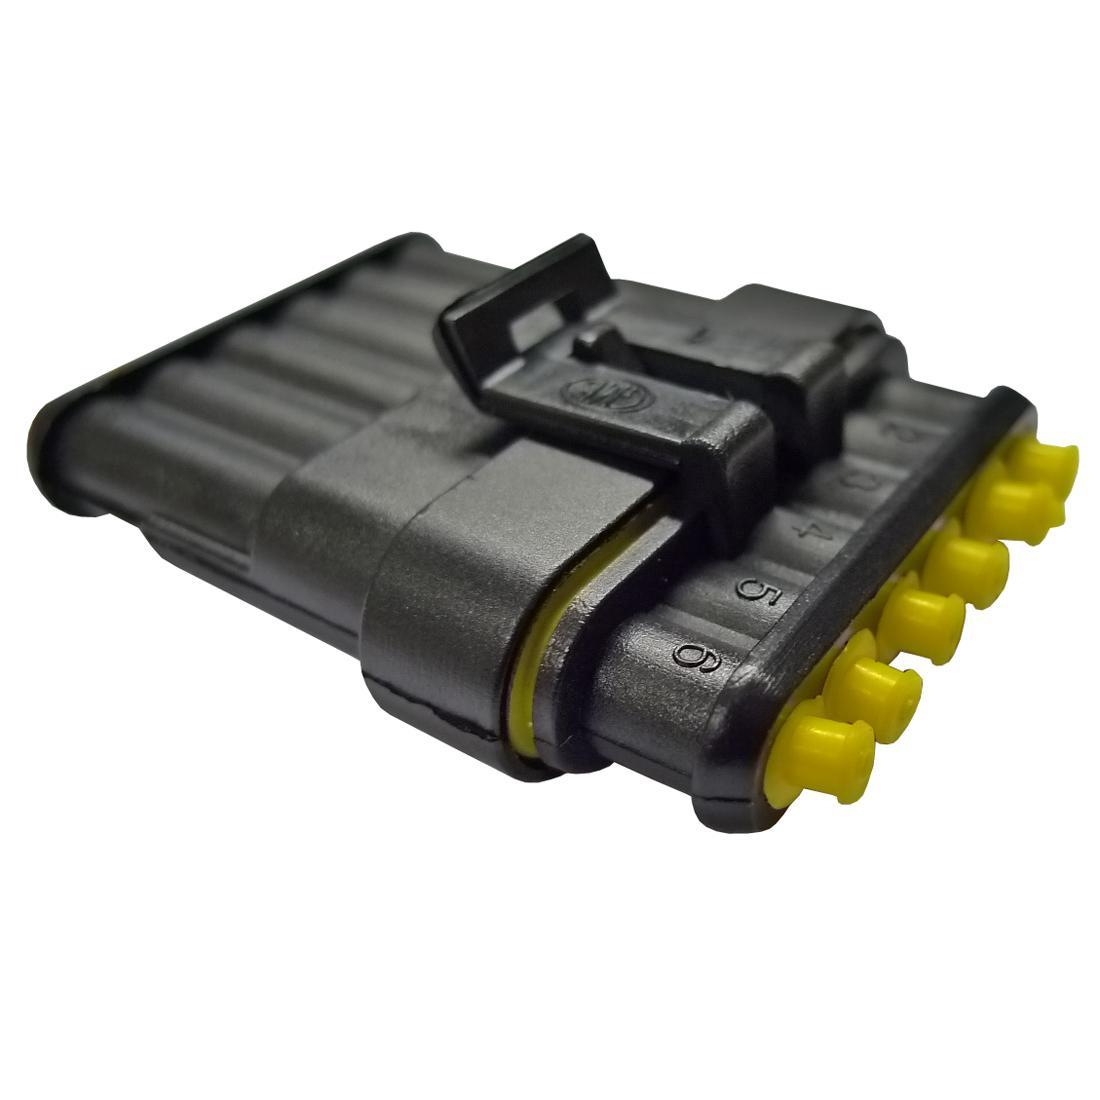 Six Pin Waterproof Electrical Connector From Merlin Motorsport